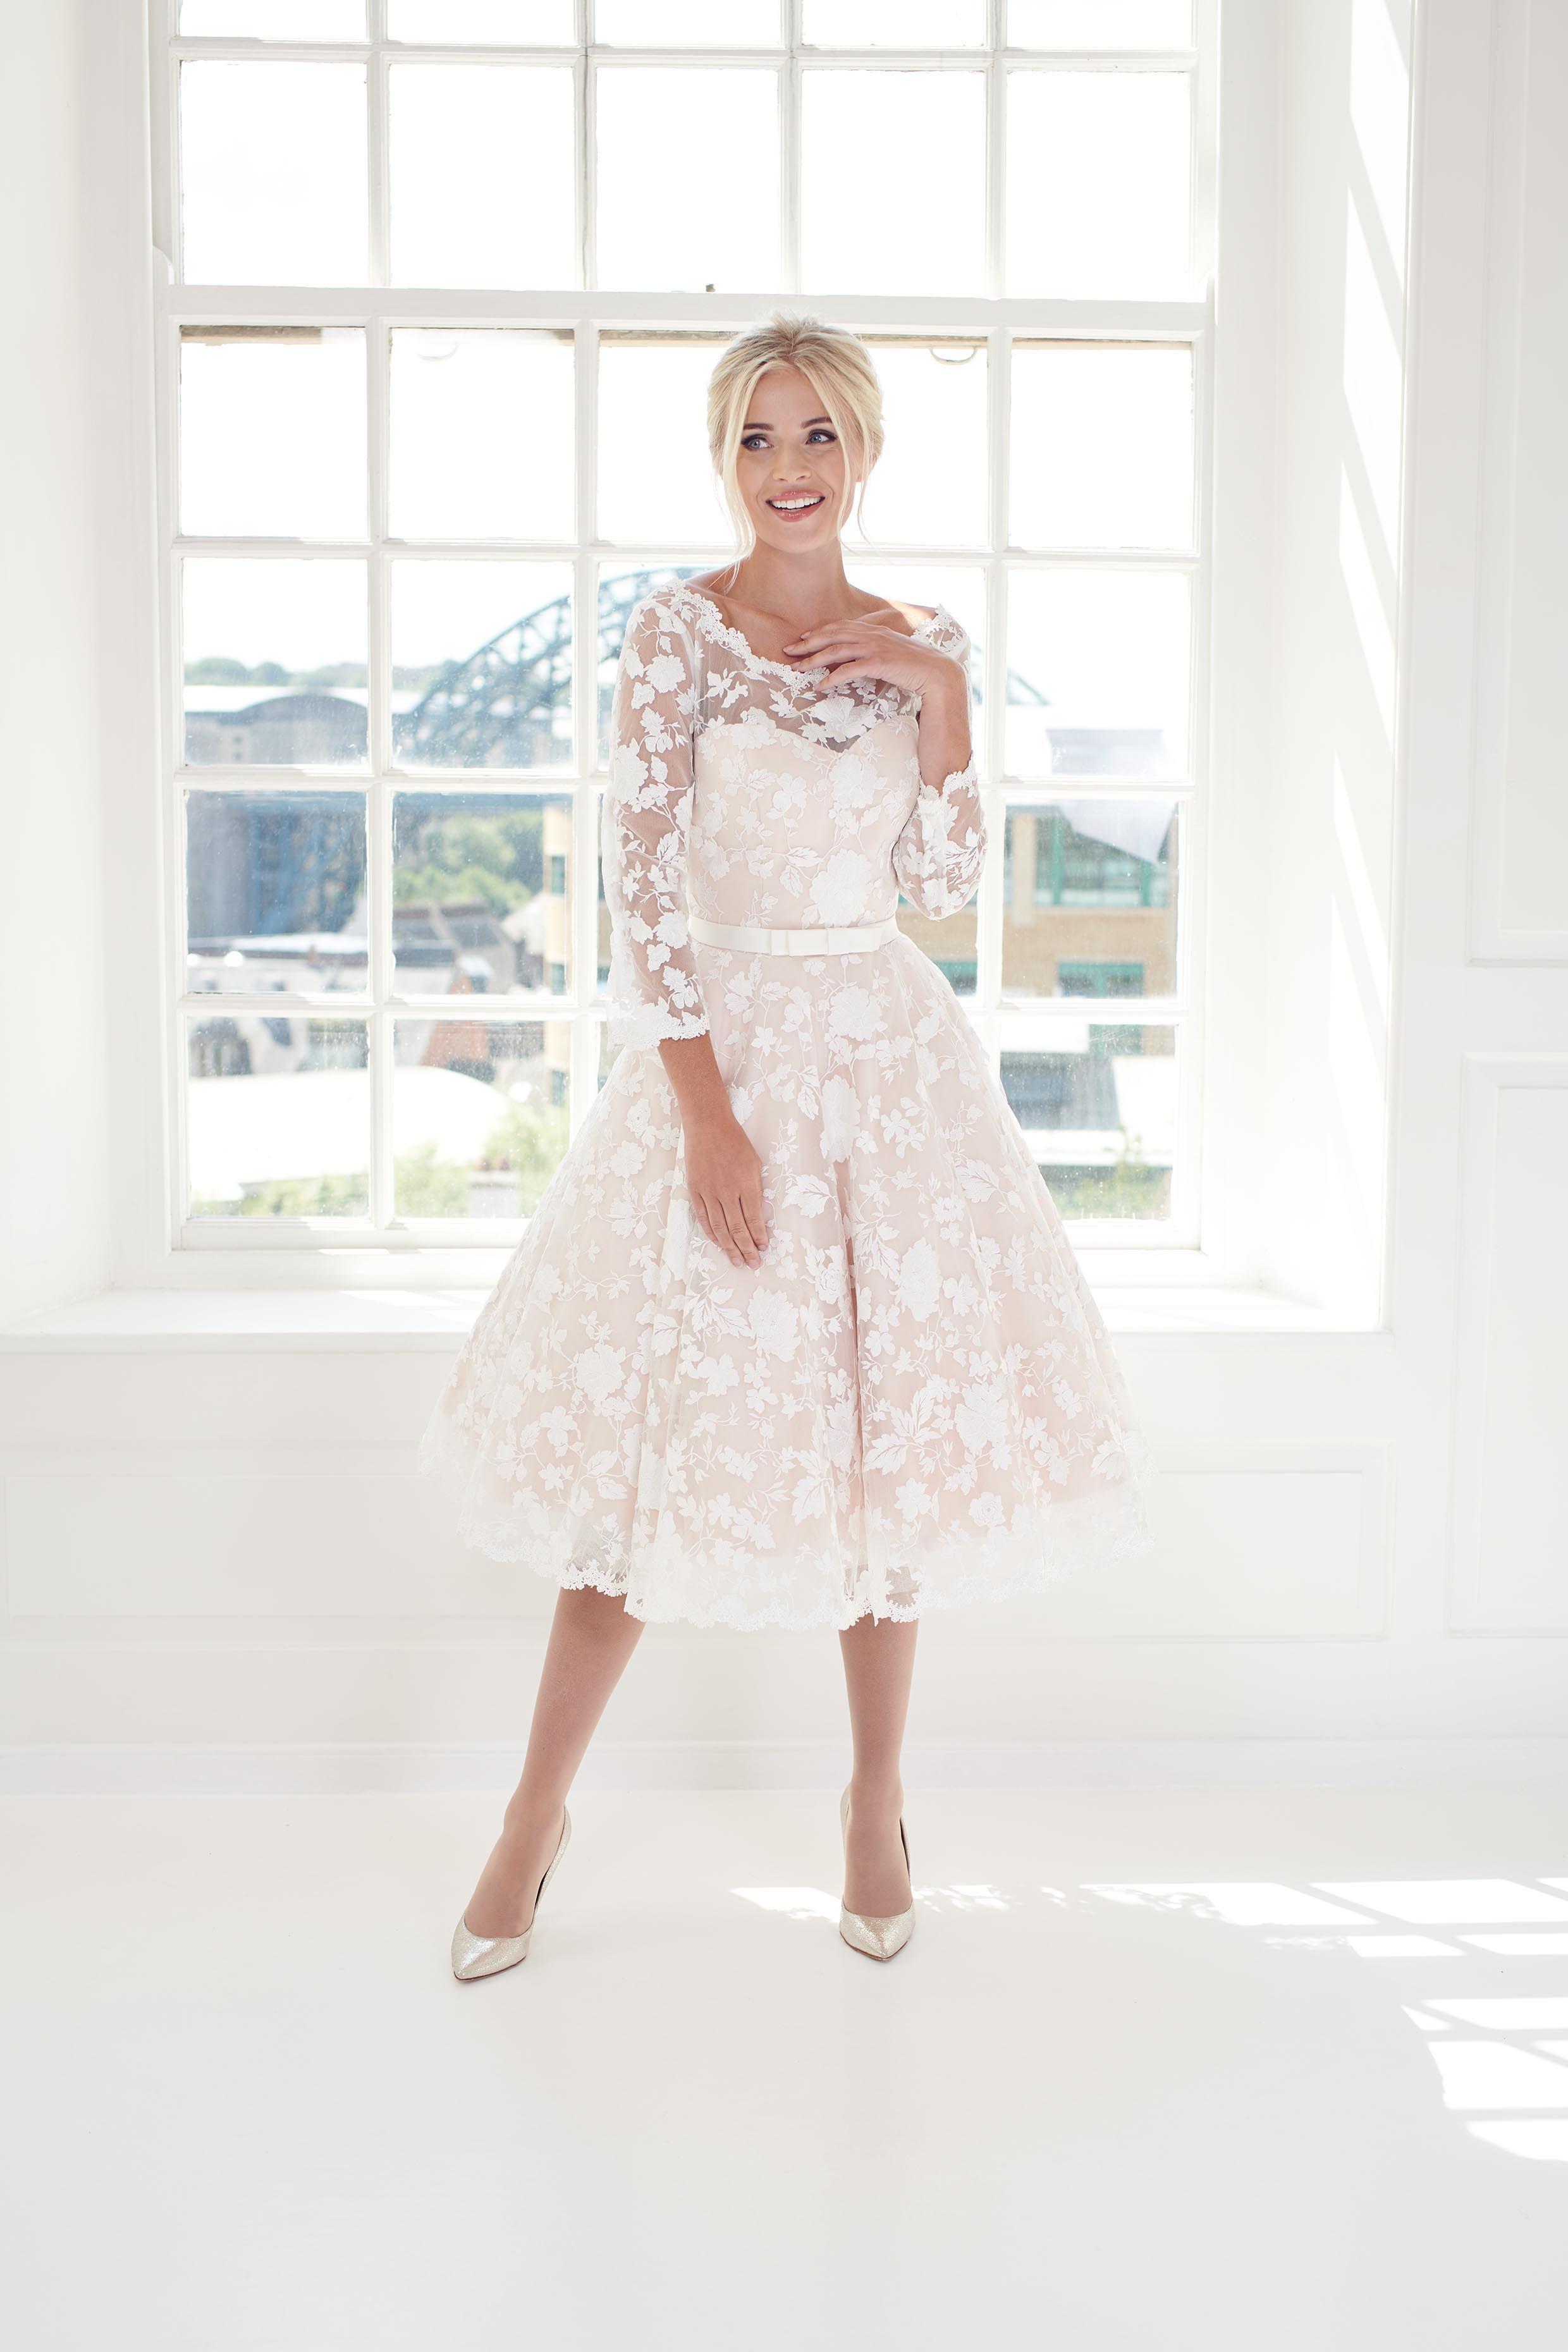 Blush vintage inspired 1950's short tea length wedding